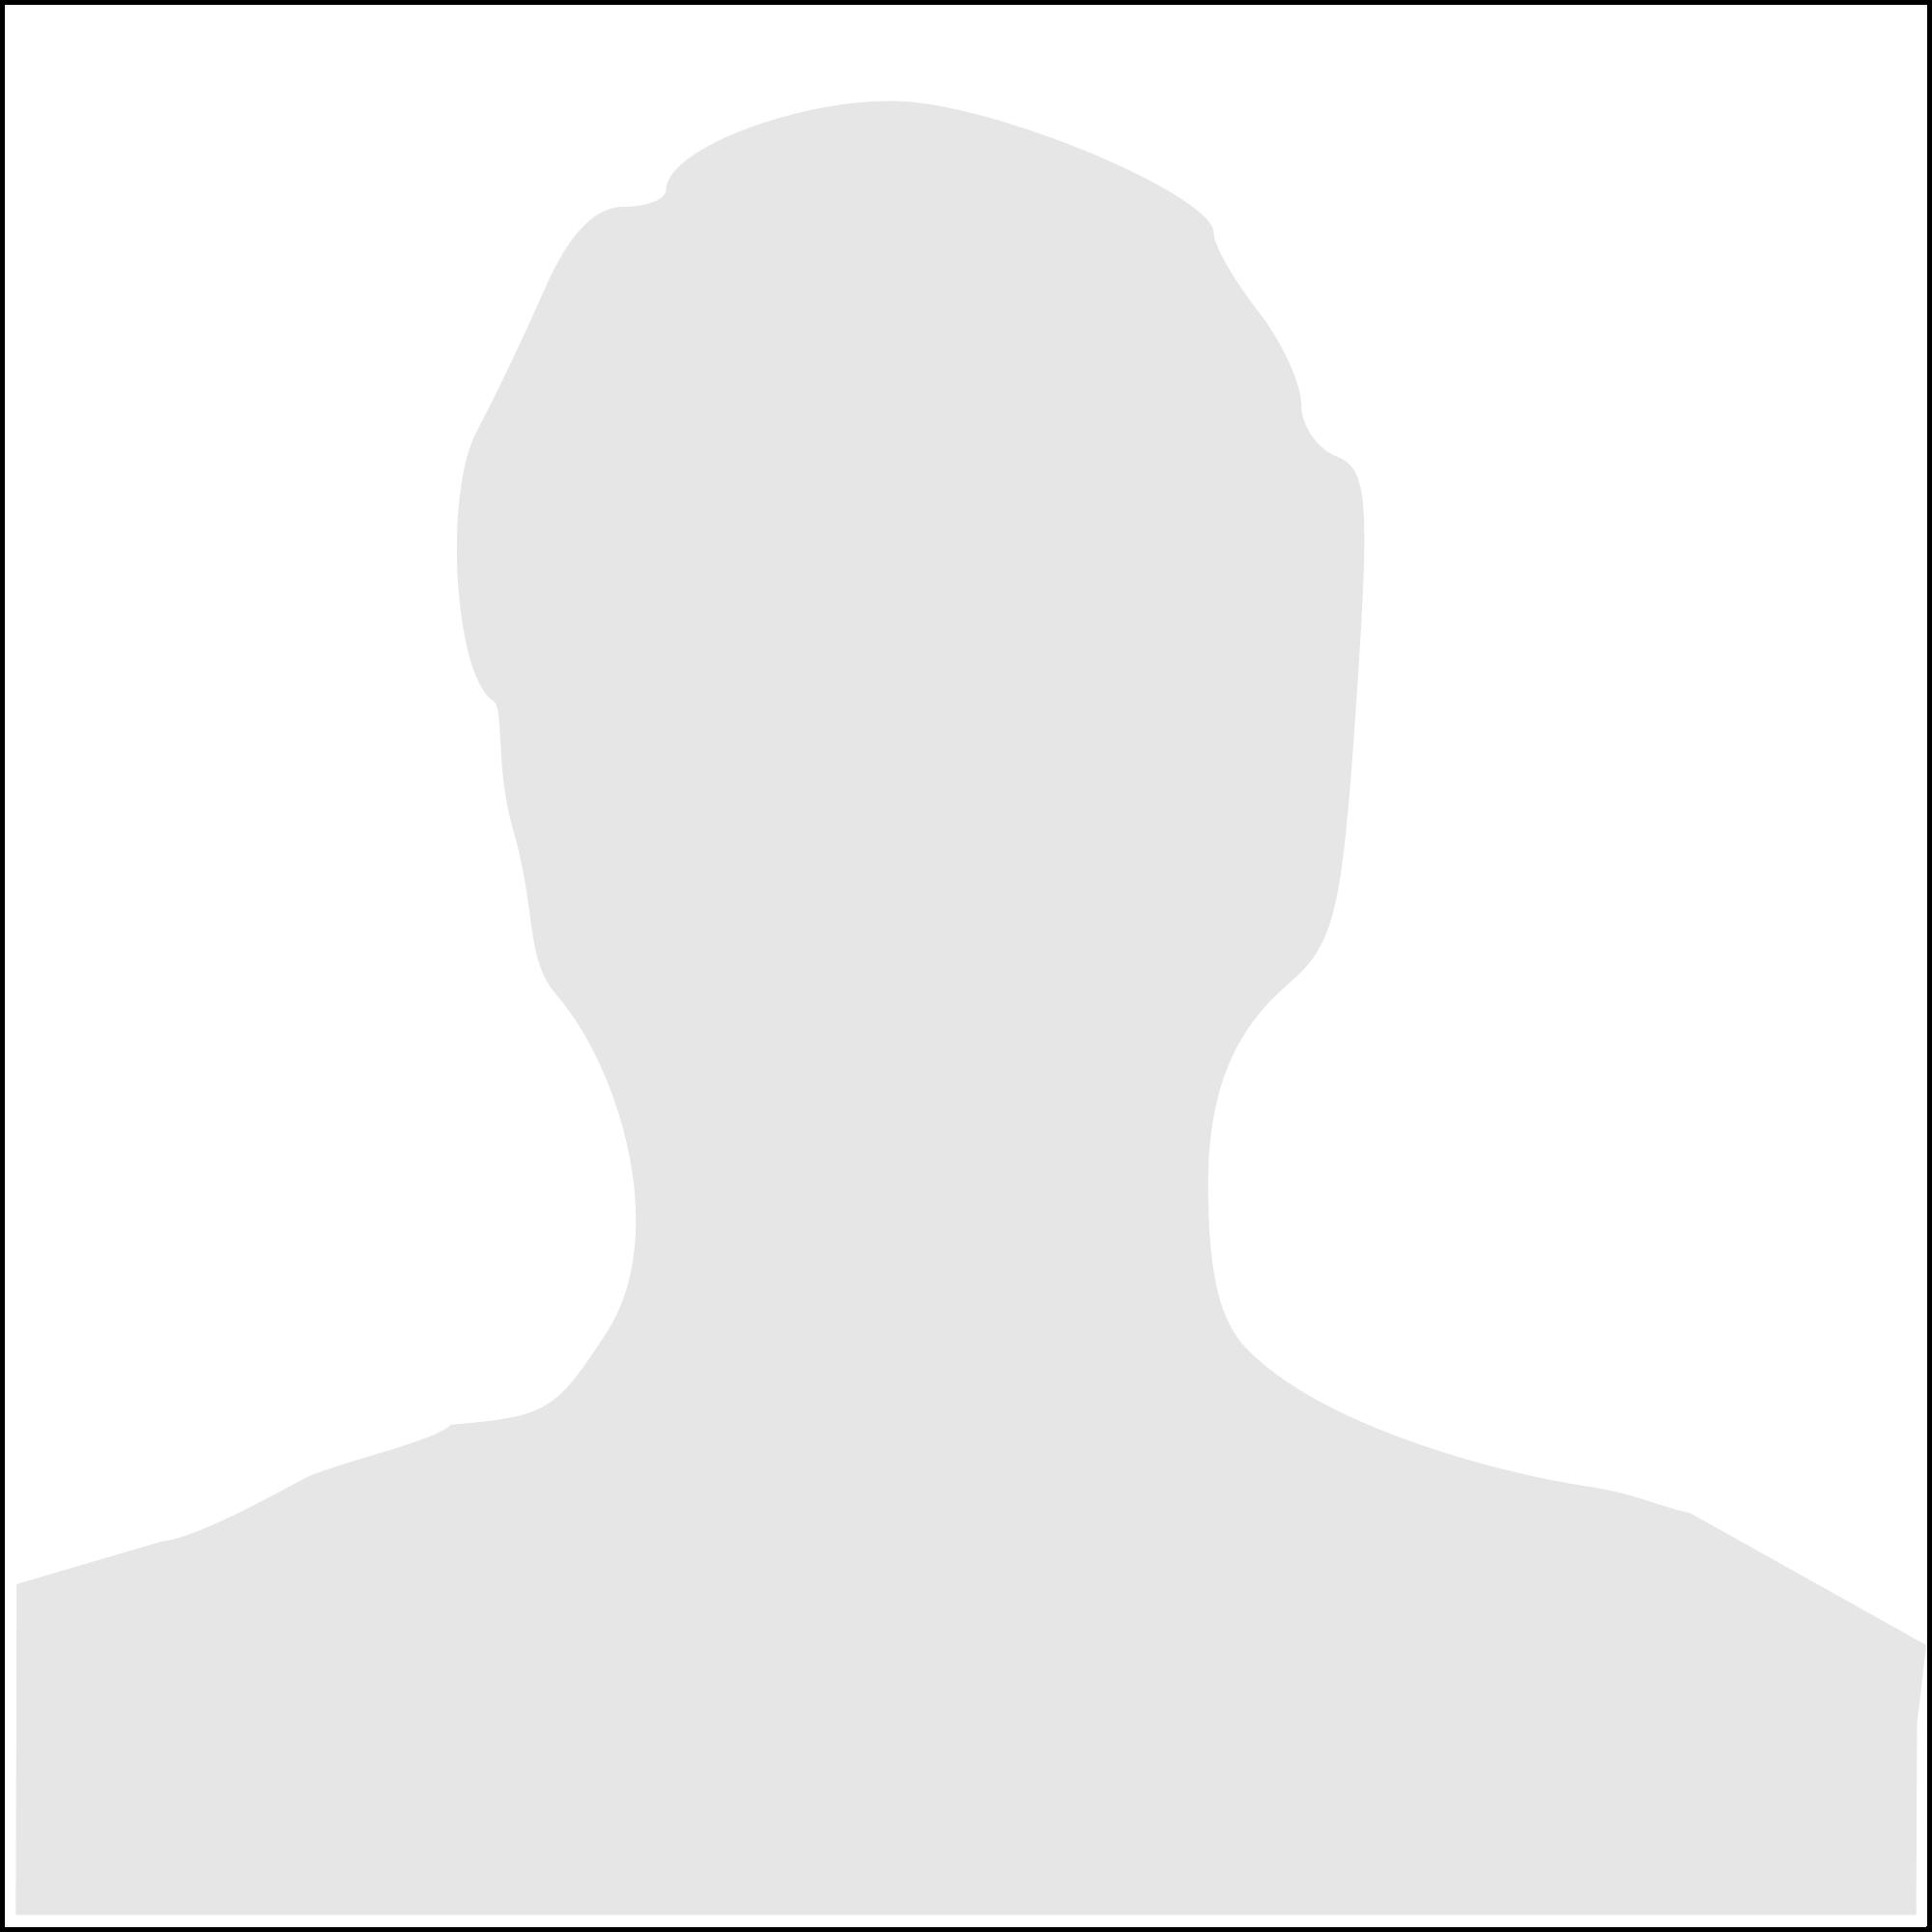 Edward Pickett headshot